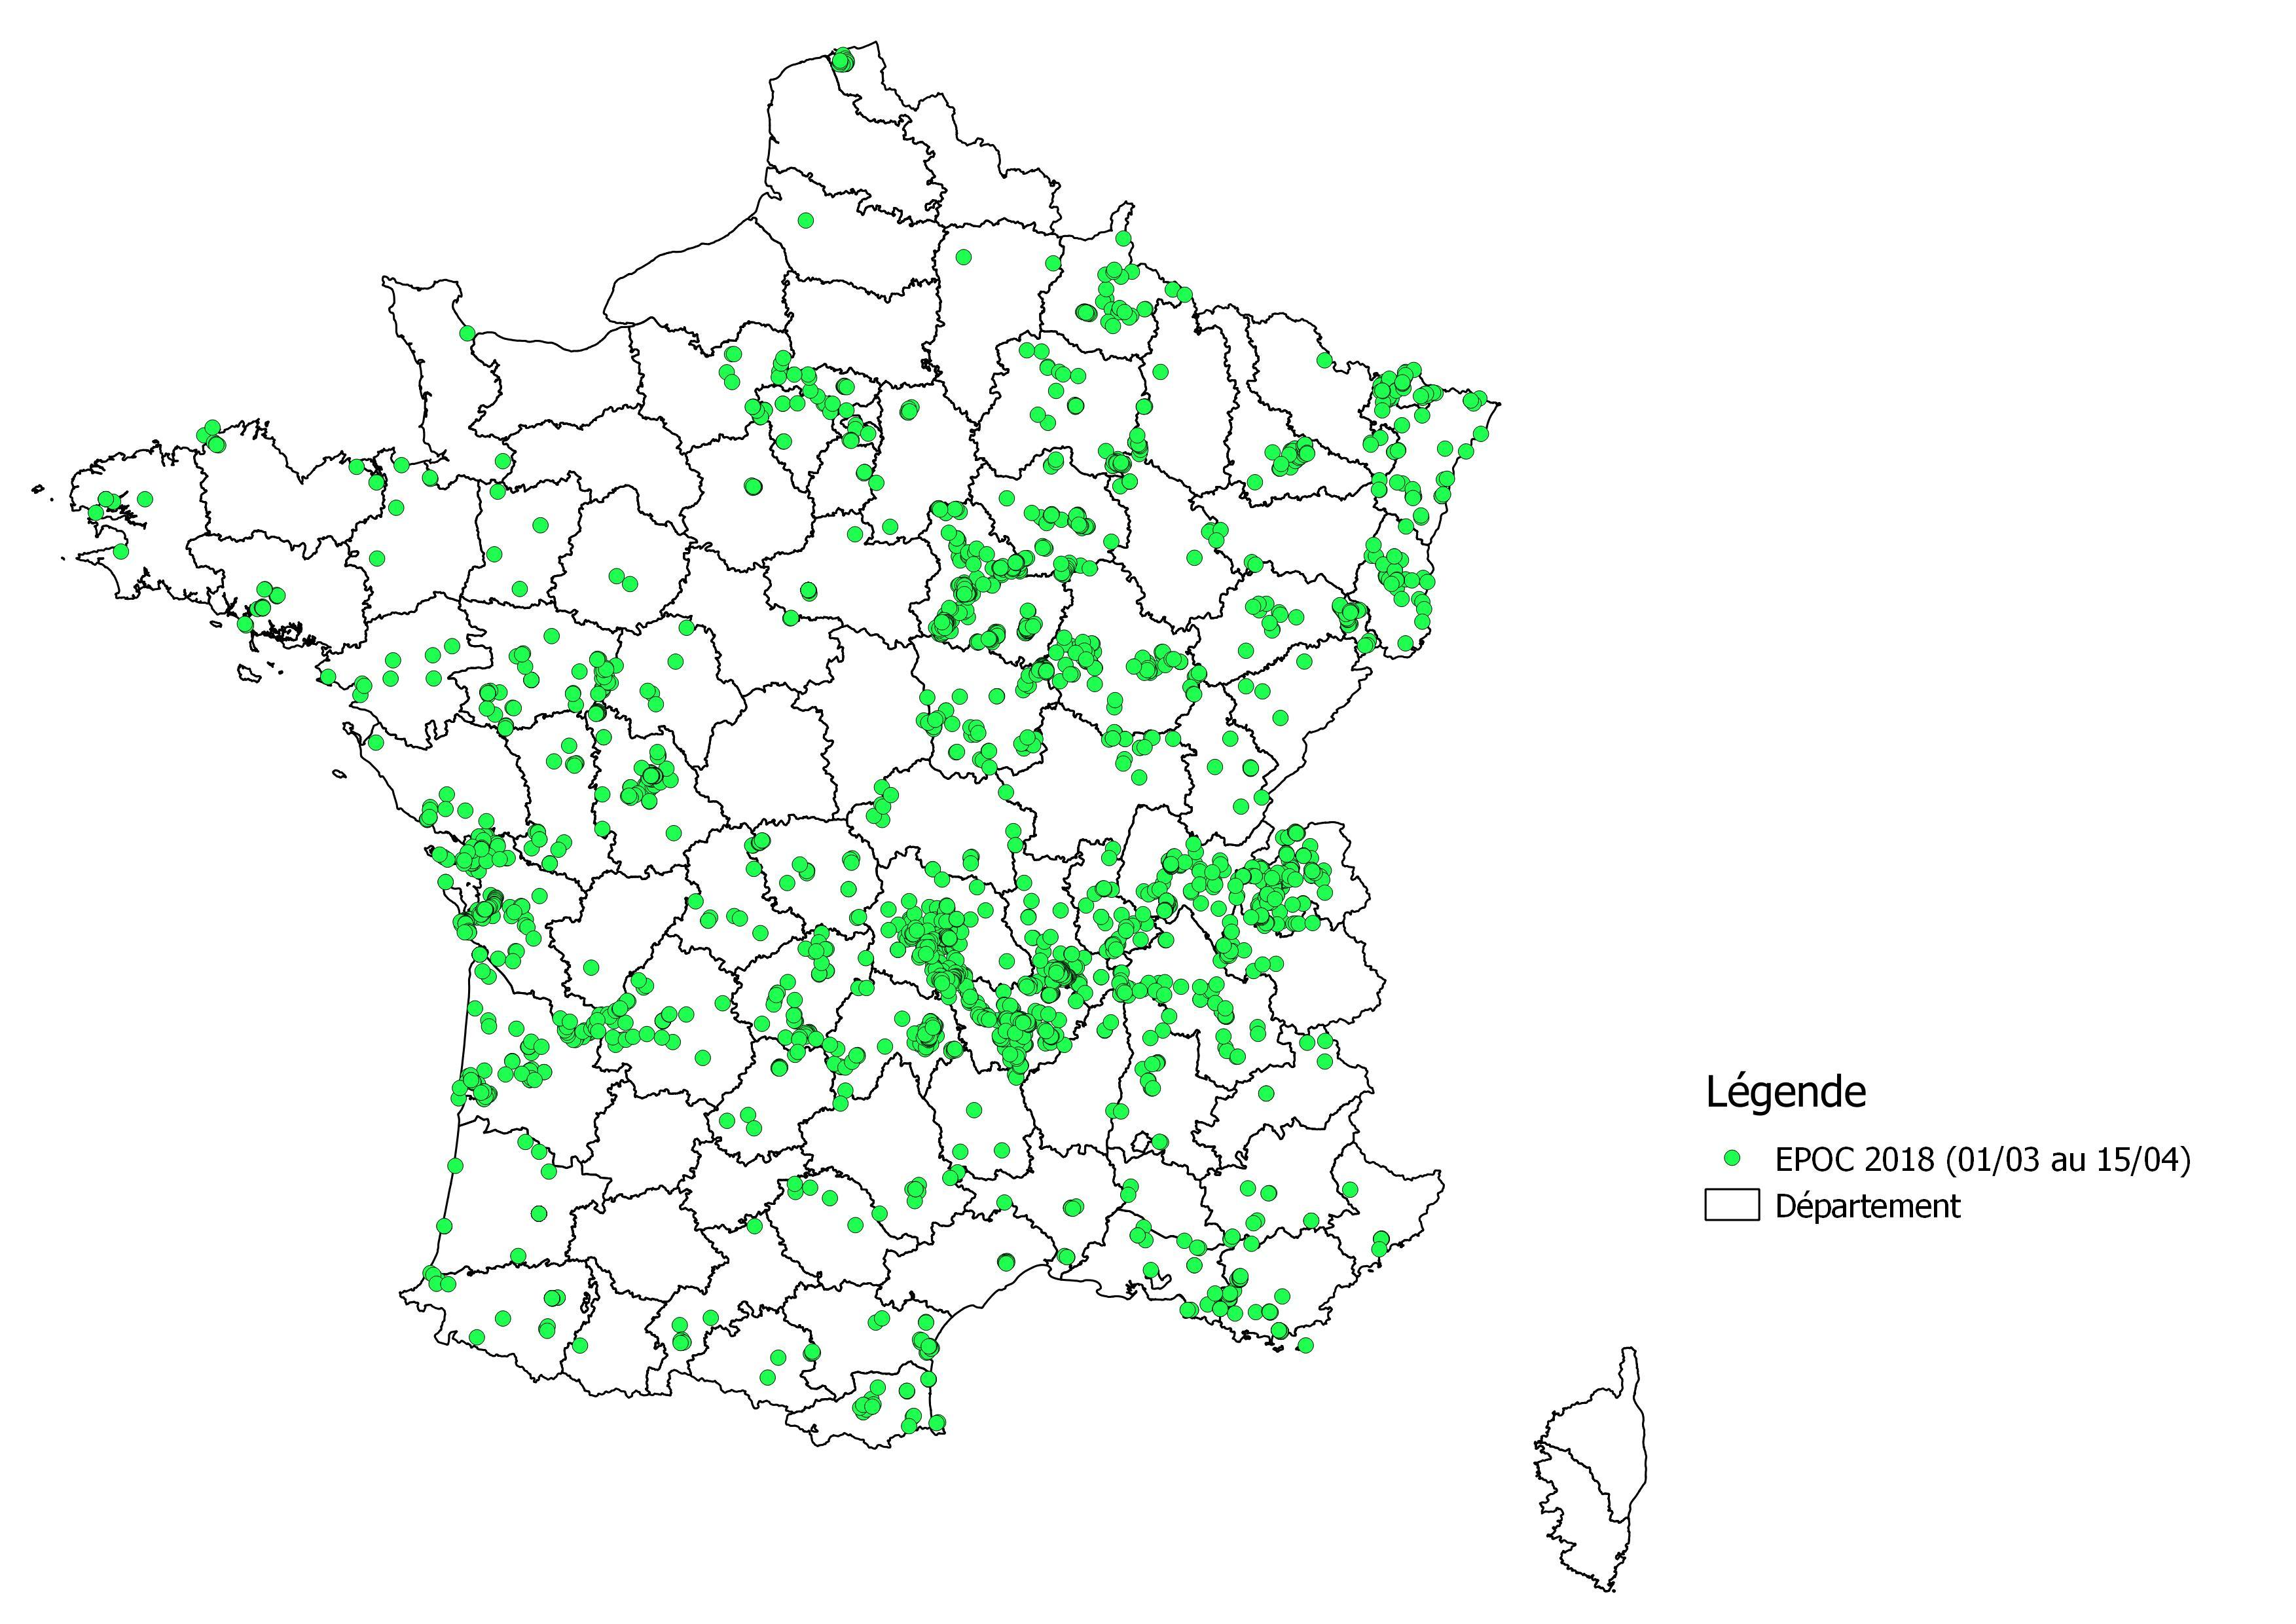 https://cdnfiles1.biolovision.net/www.faune-france.org/userfiles/epoc2018.jpeg